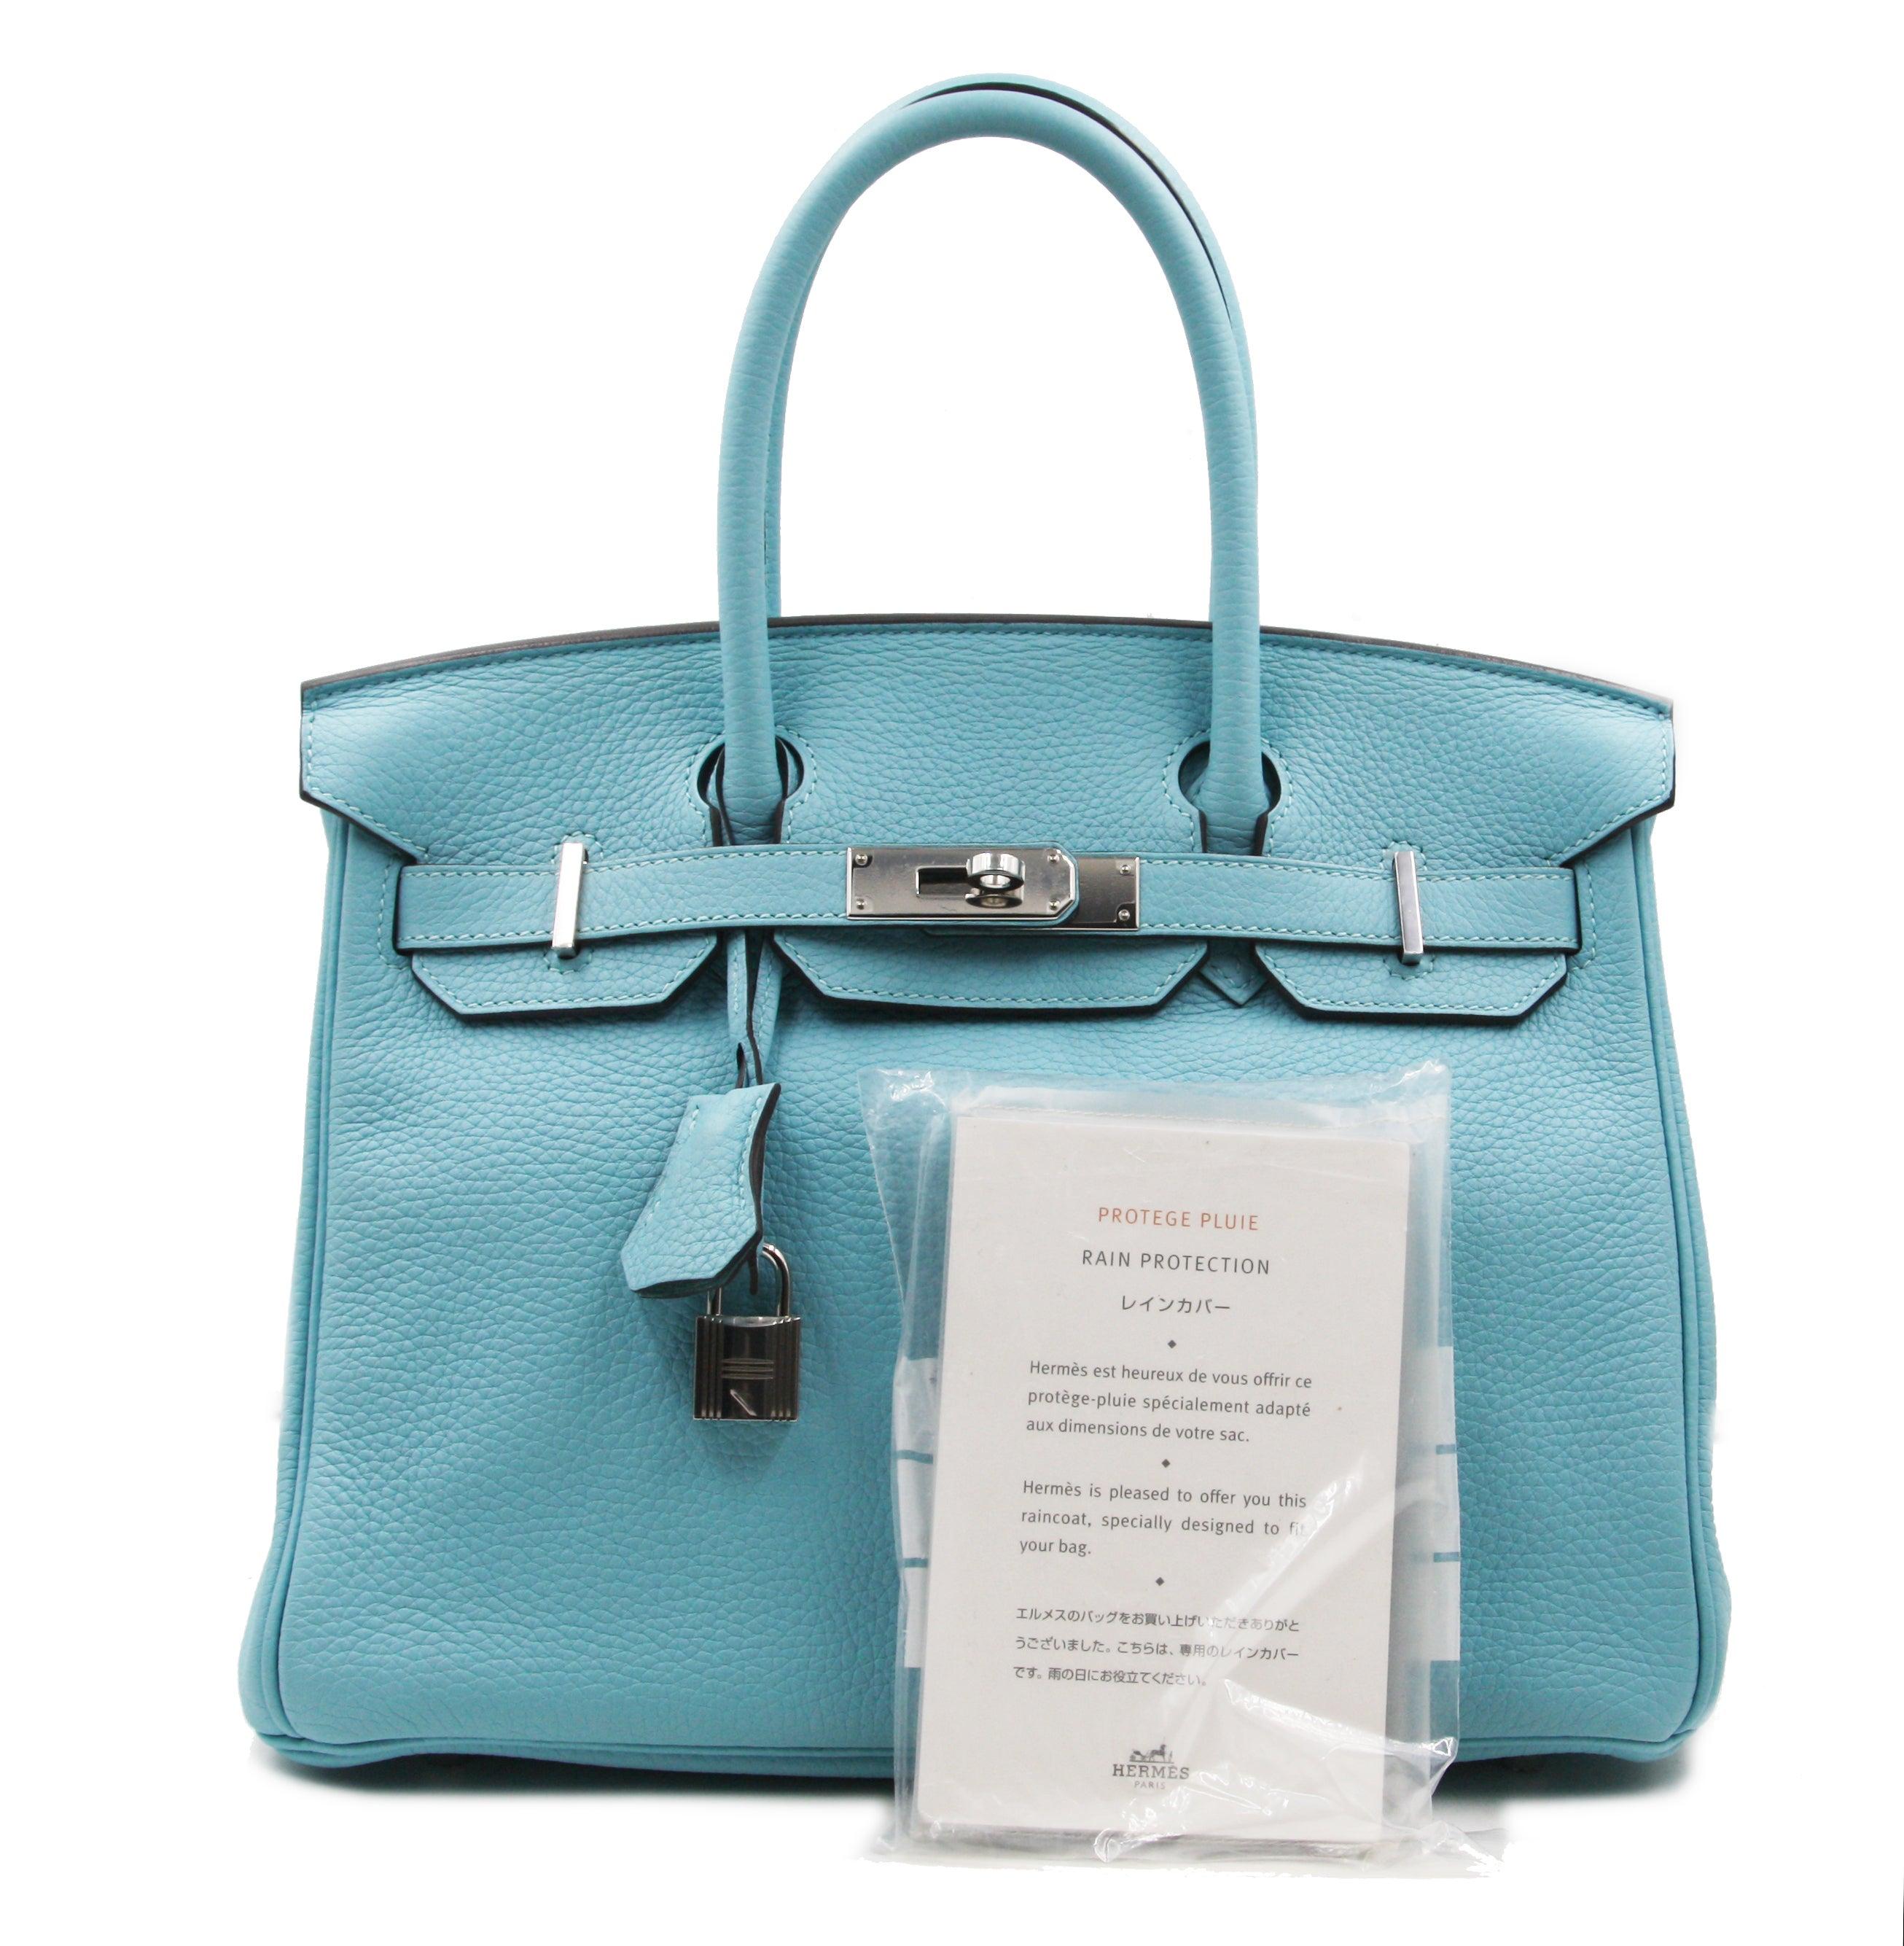 769b5b7f0edd Hermes Birkin 30 Togo Blue Atoll 3p/Palladium (silver) Tote Bag at 1stdibs